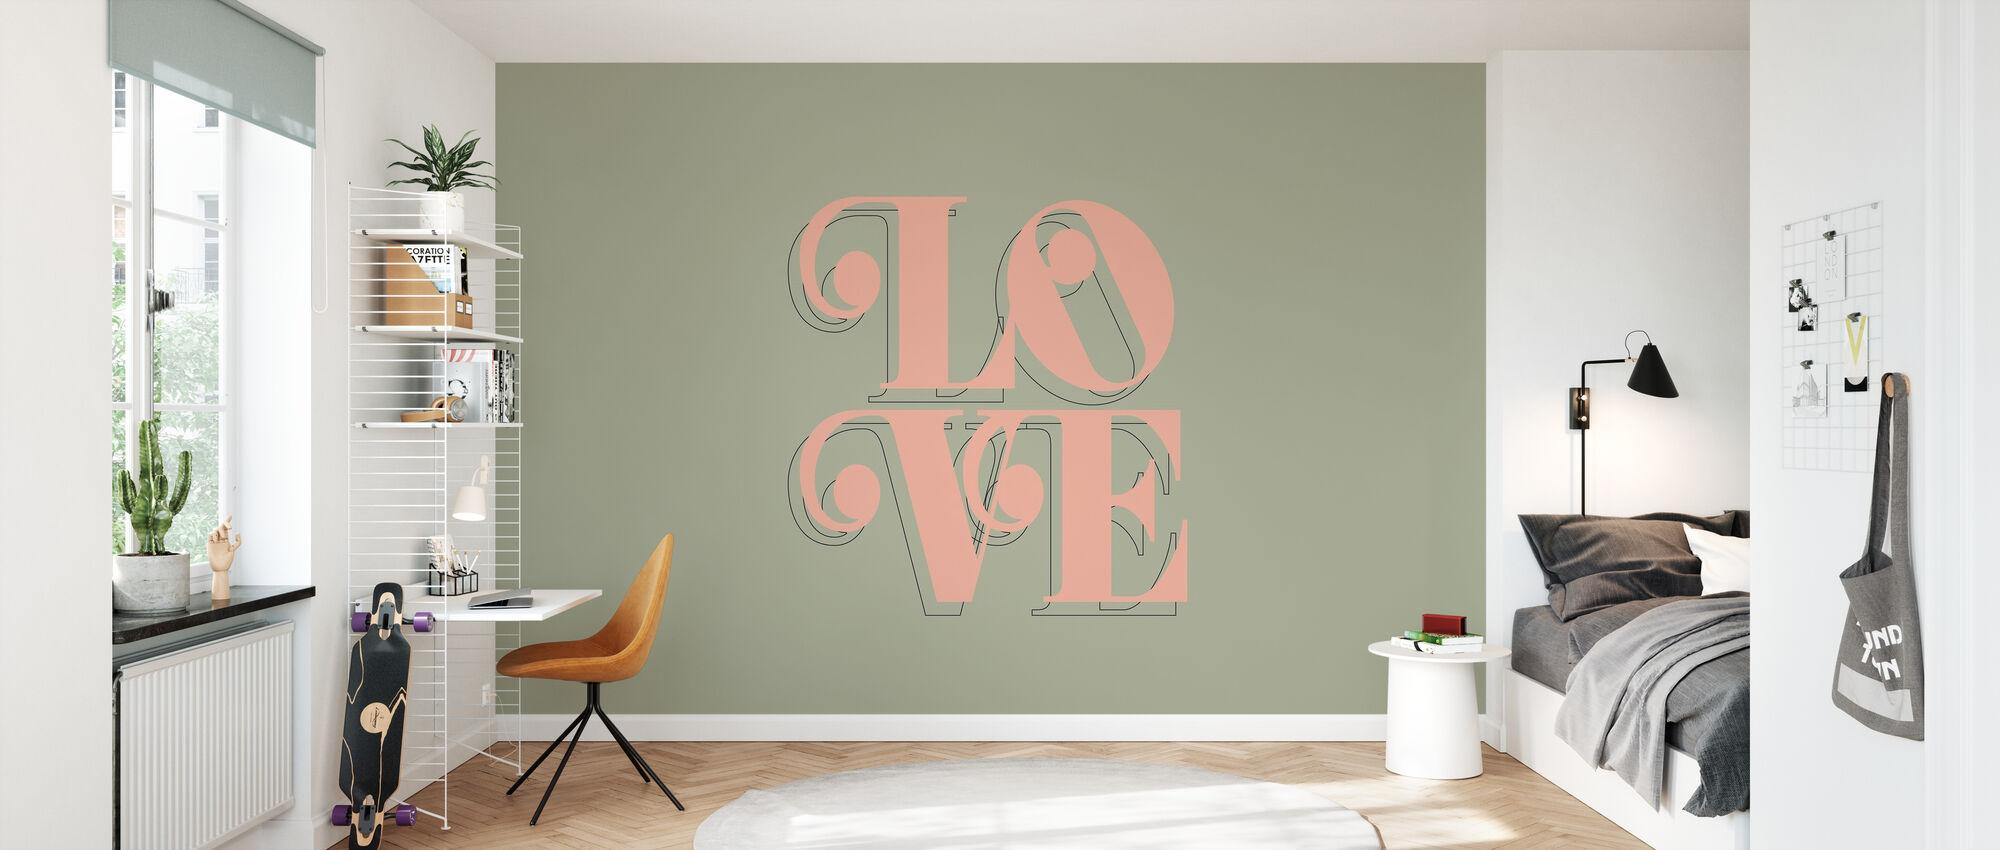 Love Kale - Wallpaper - Kids Room